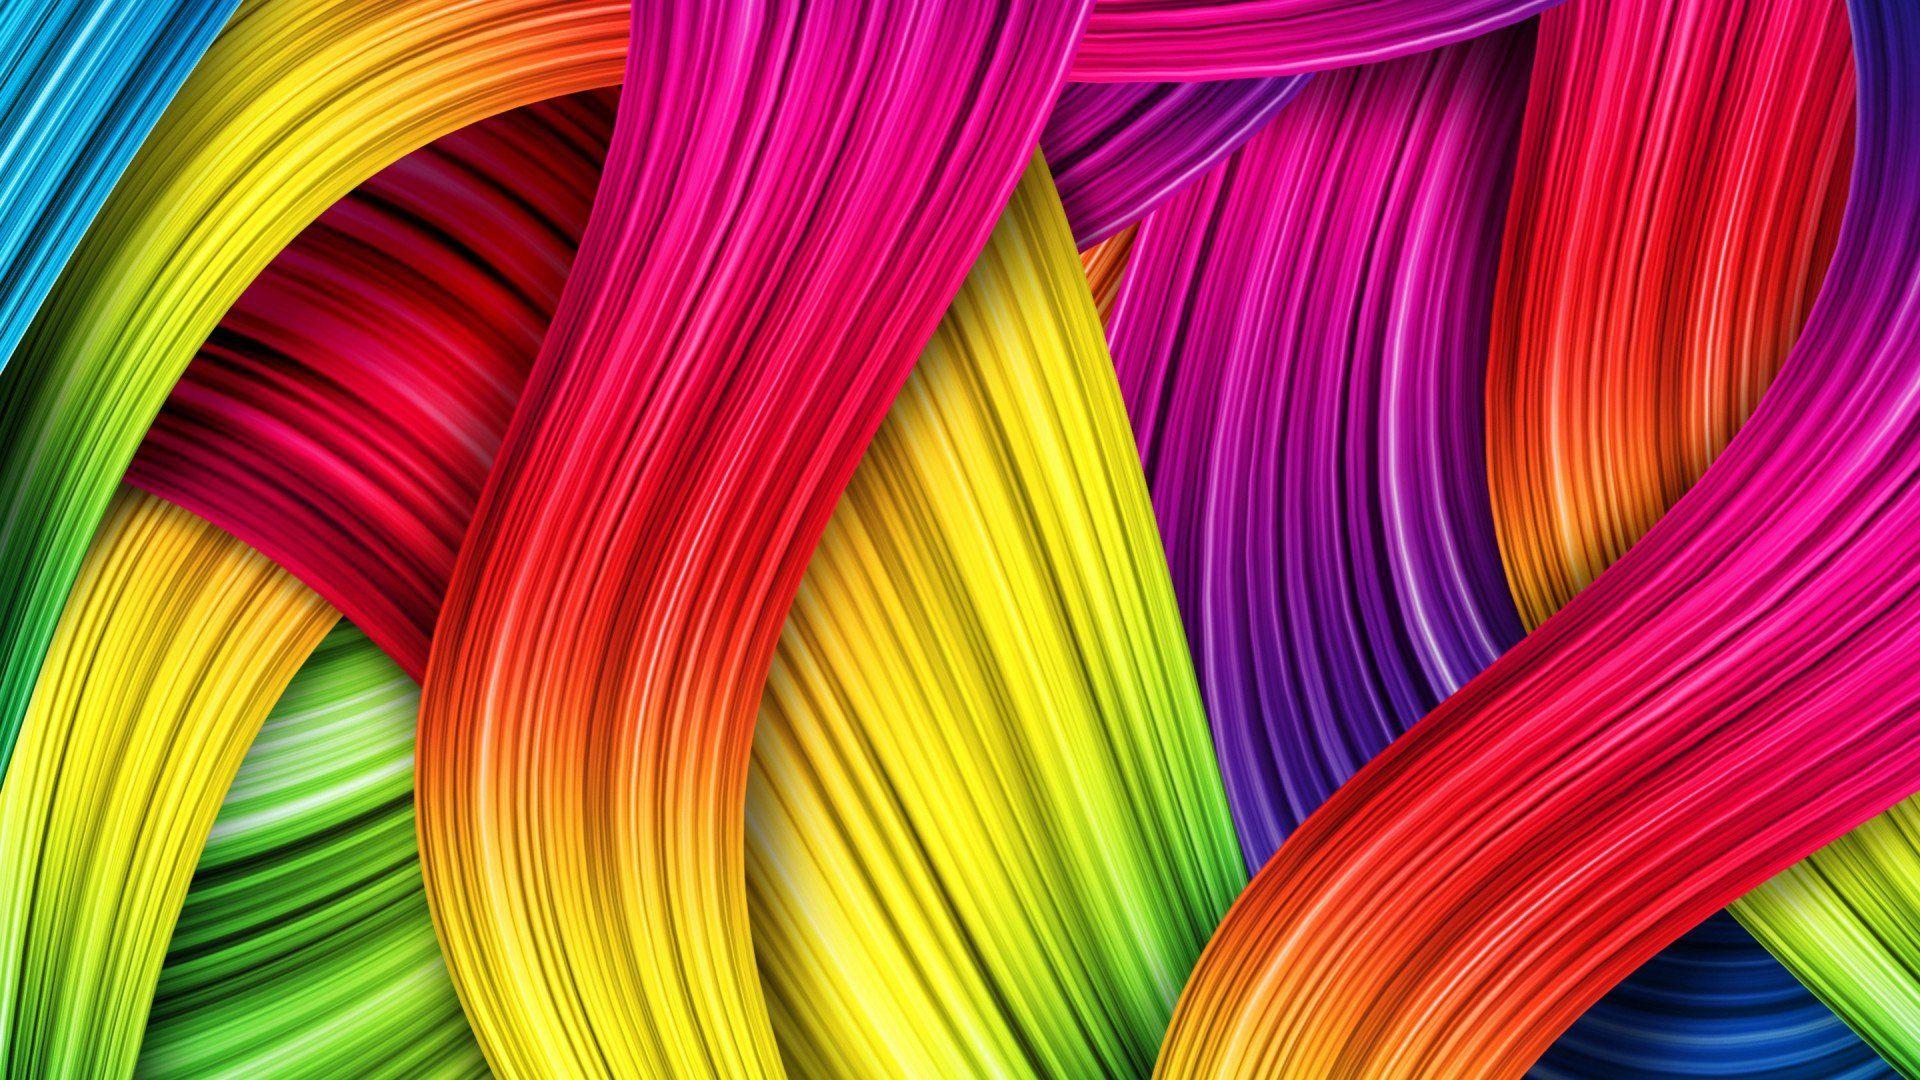 Simple Wallpaper High Quality Abstract - 21f191bd1f24845a44b75f85902c9838  Gallery_22774.jpg